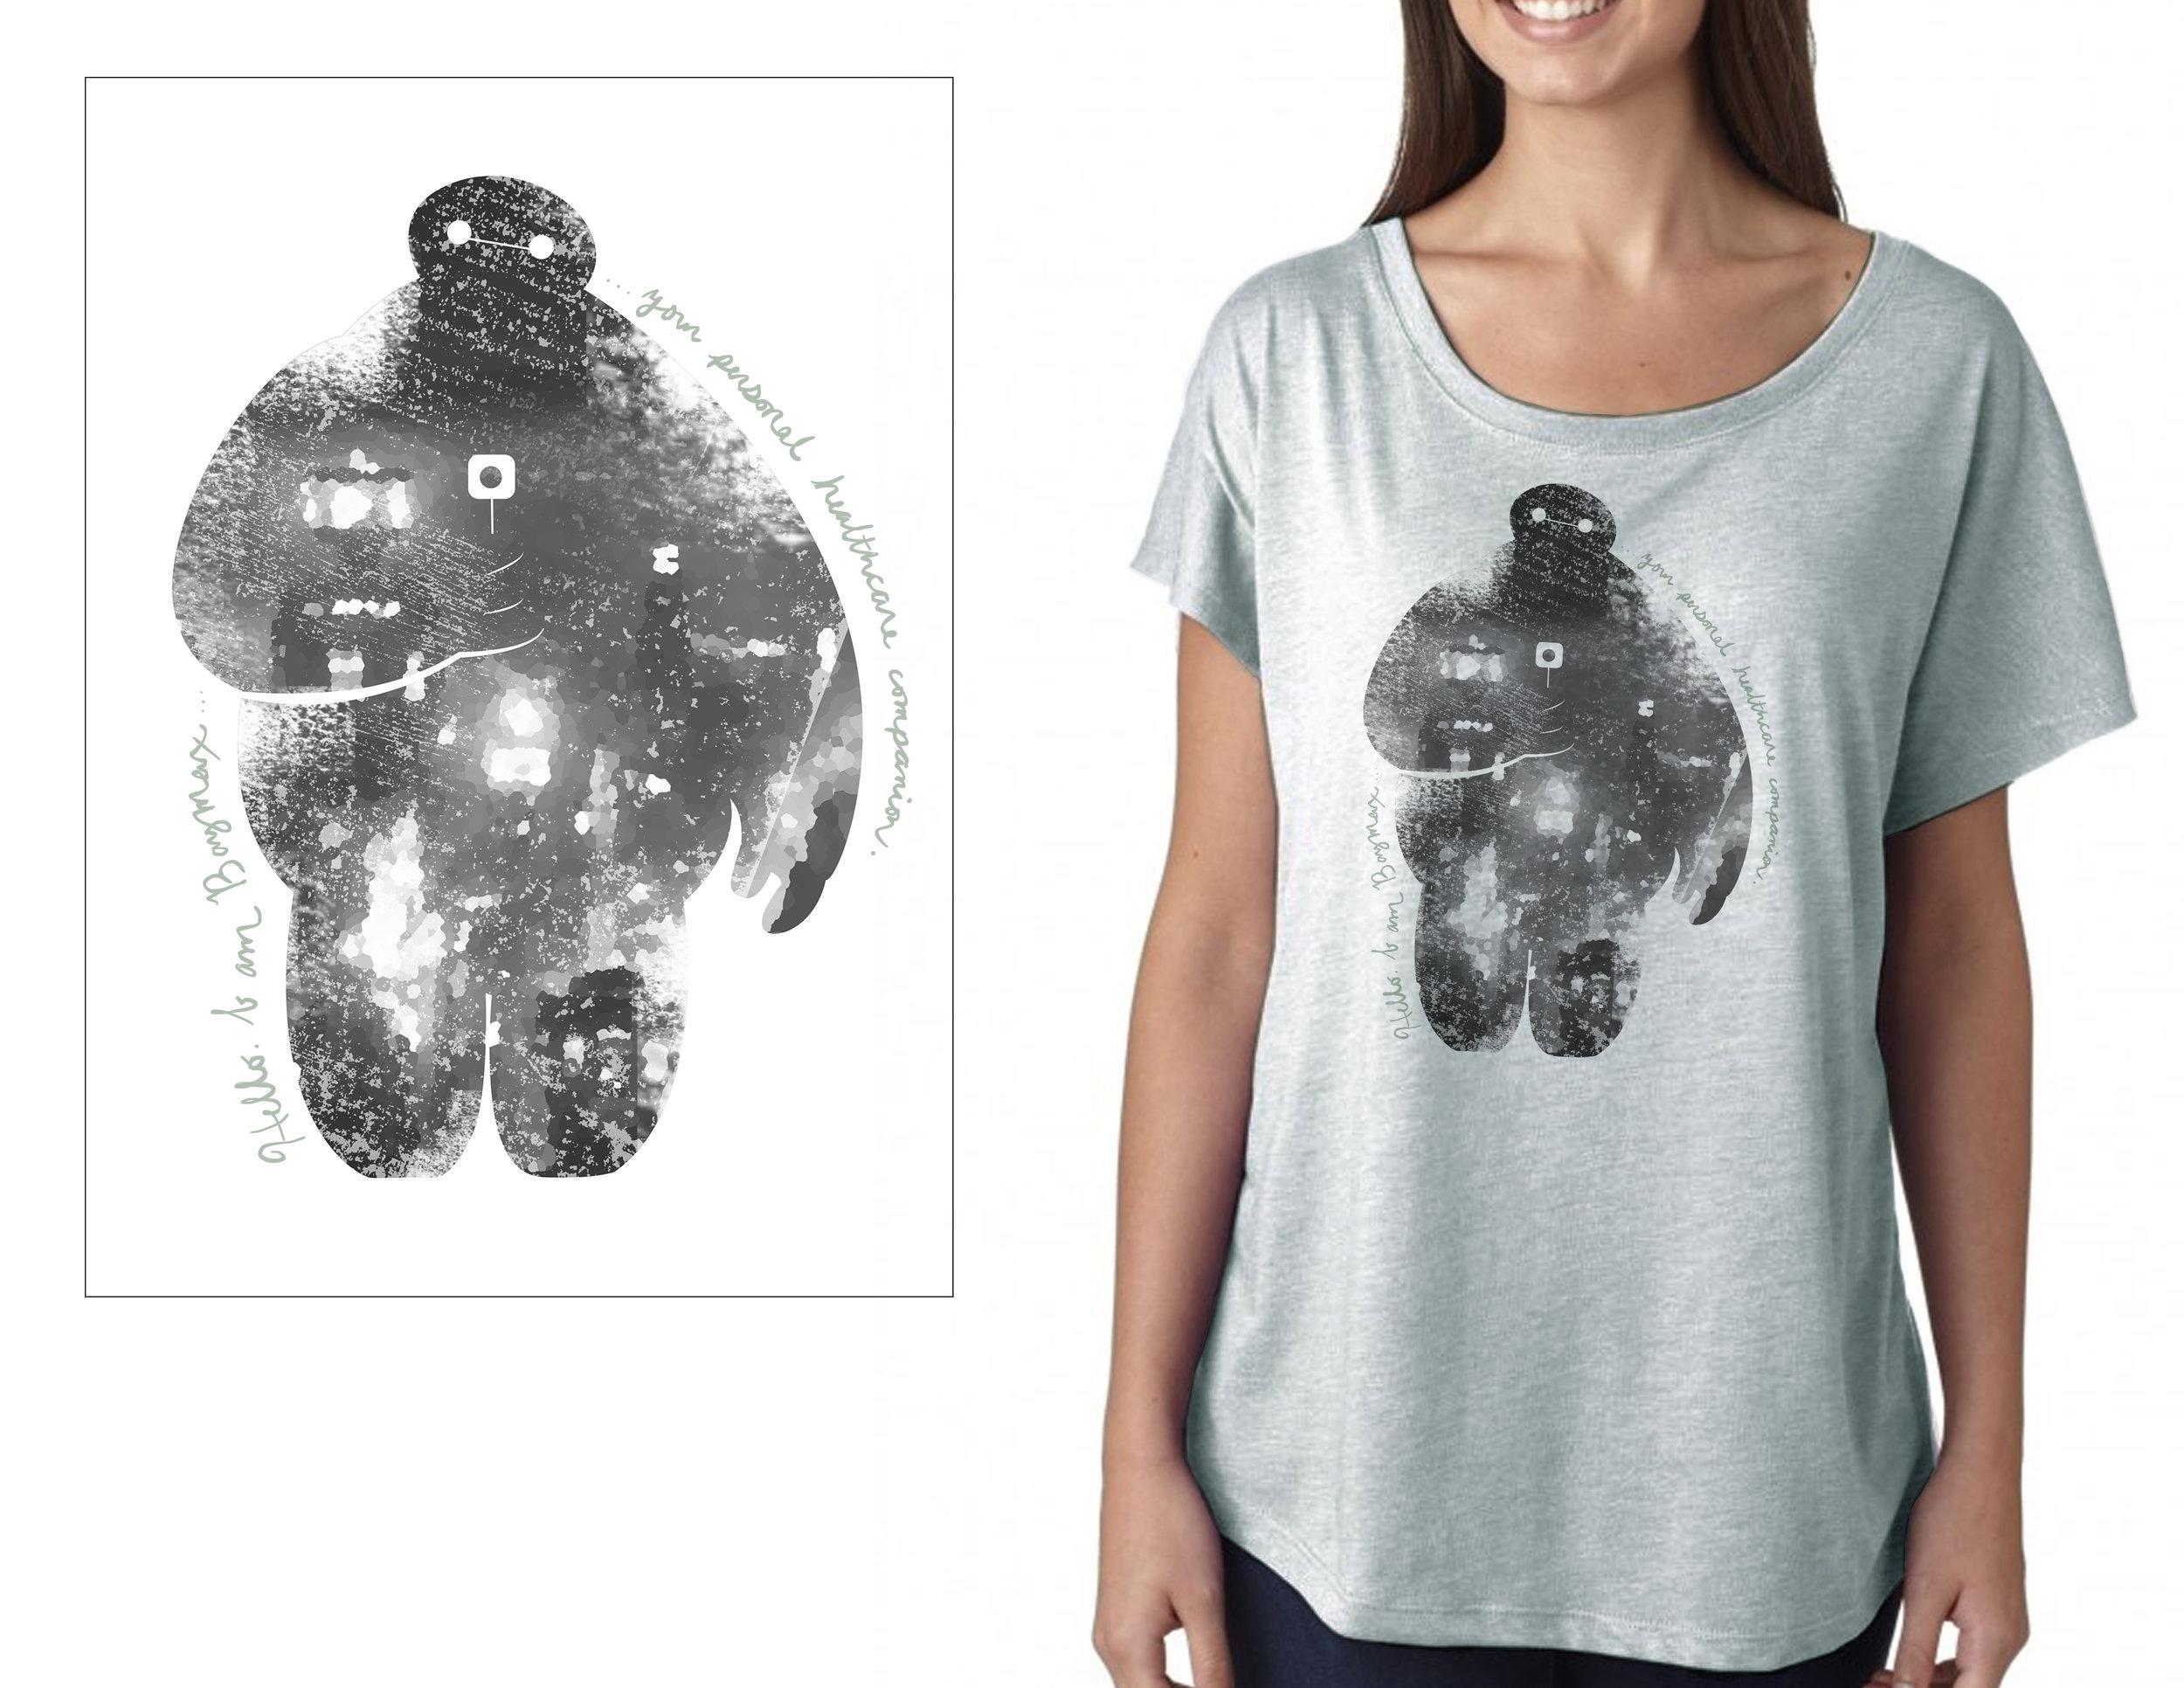 baymax shirt.jpg